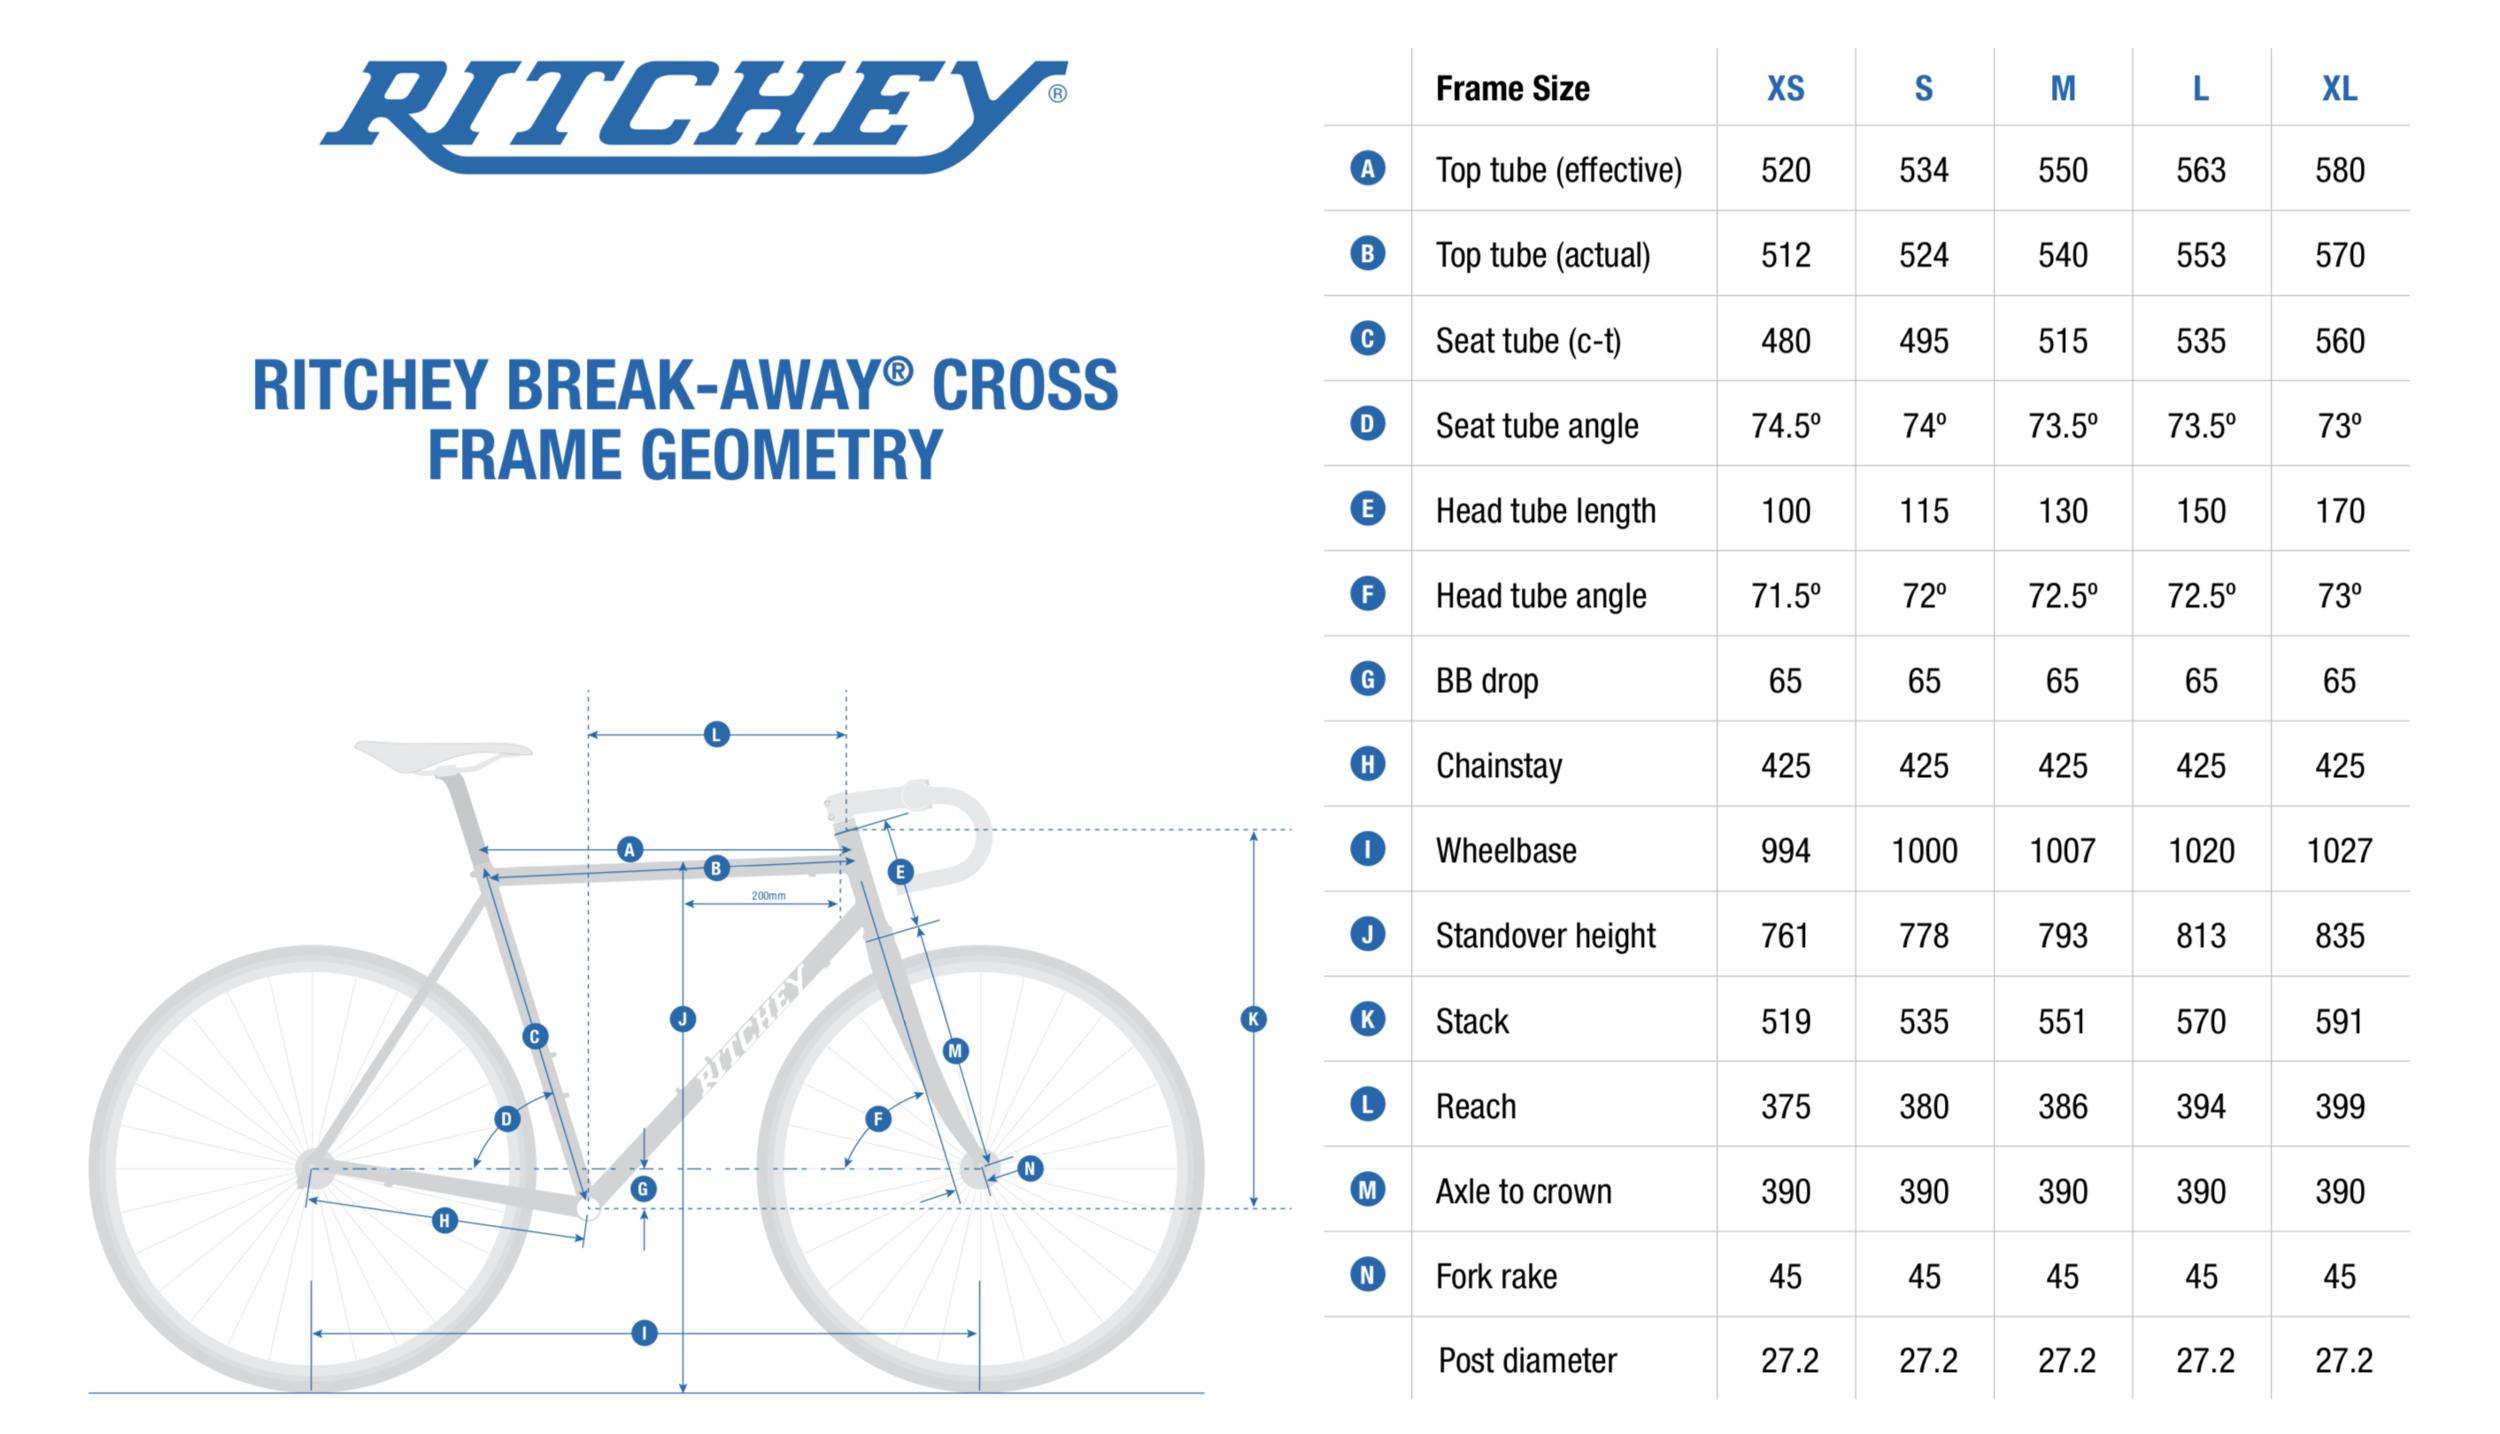 Ritchey-Breakaway-Cross-Frame-Sizing.png